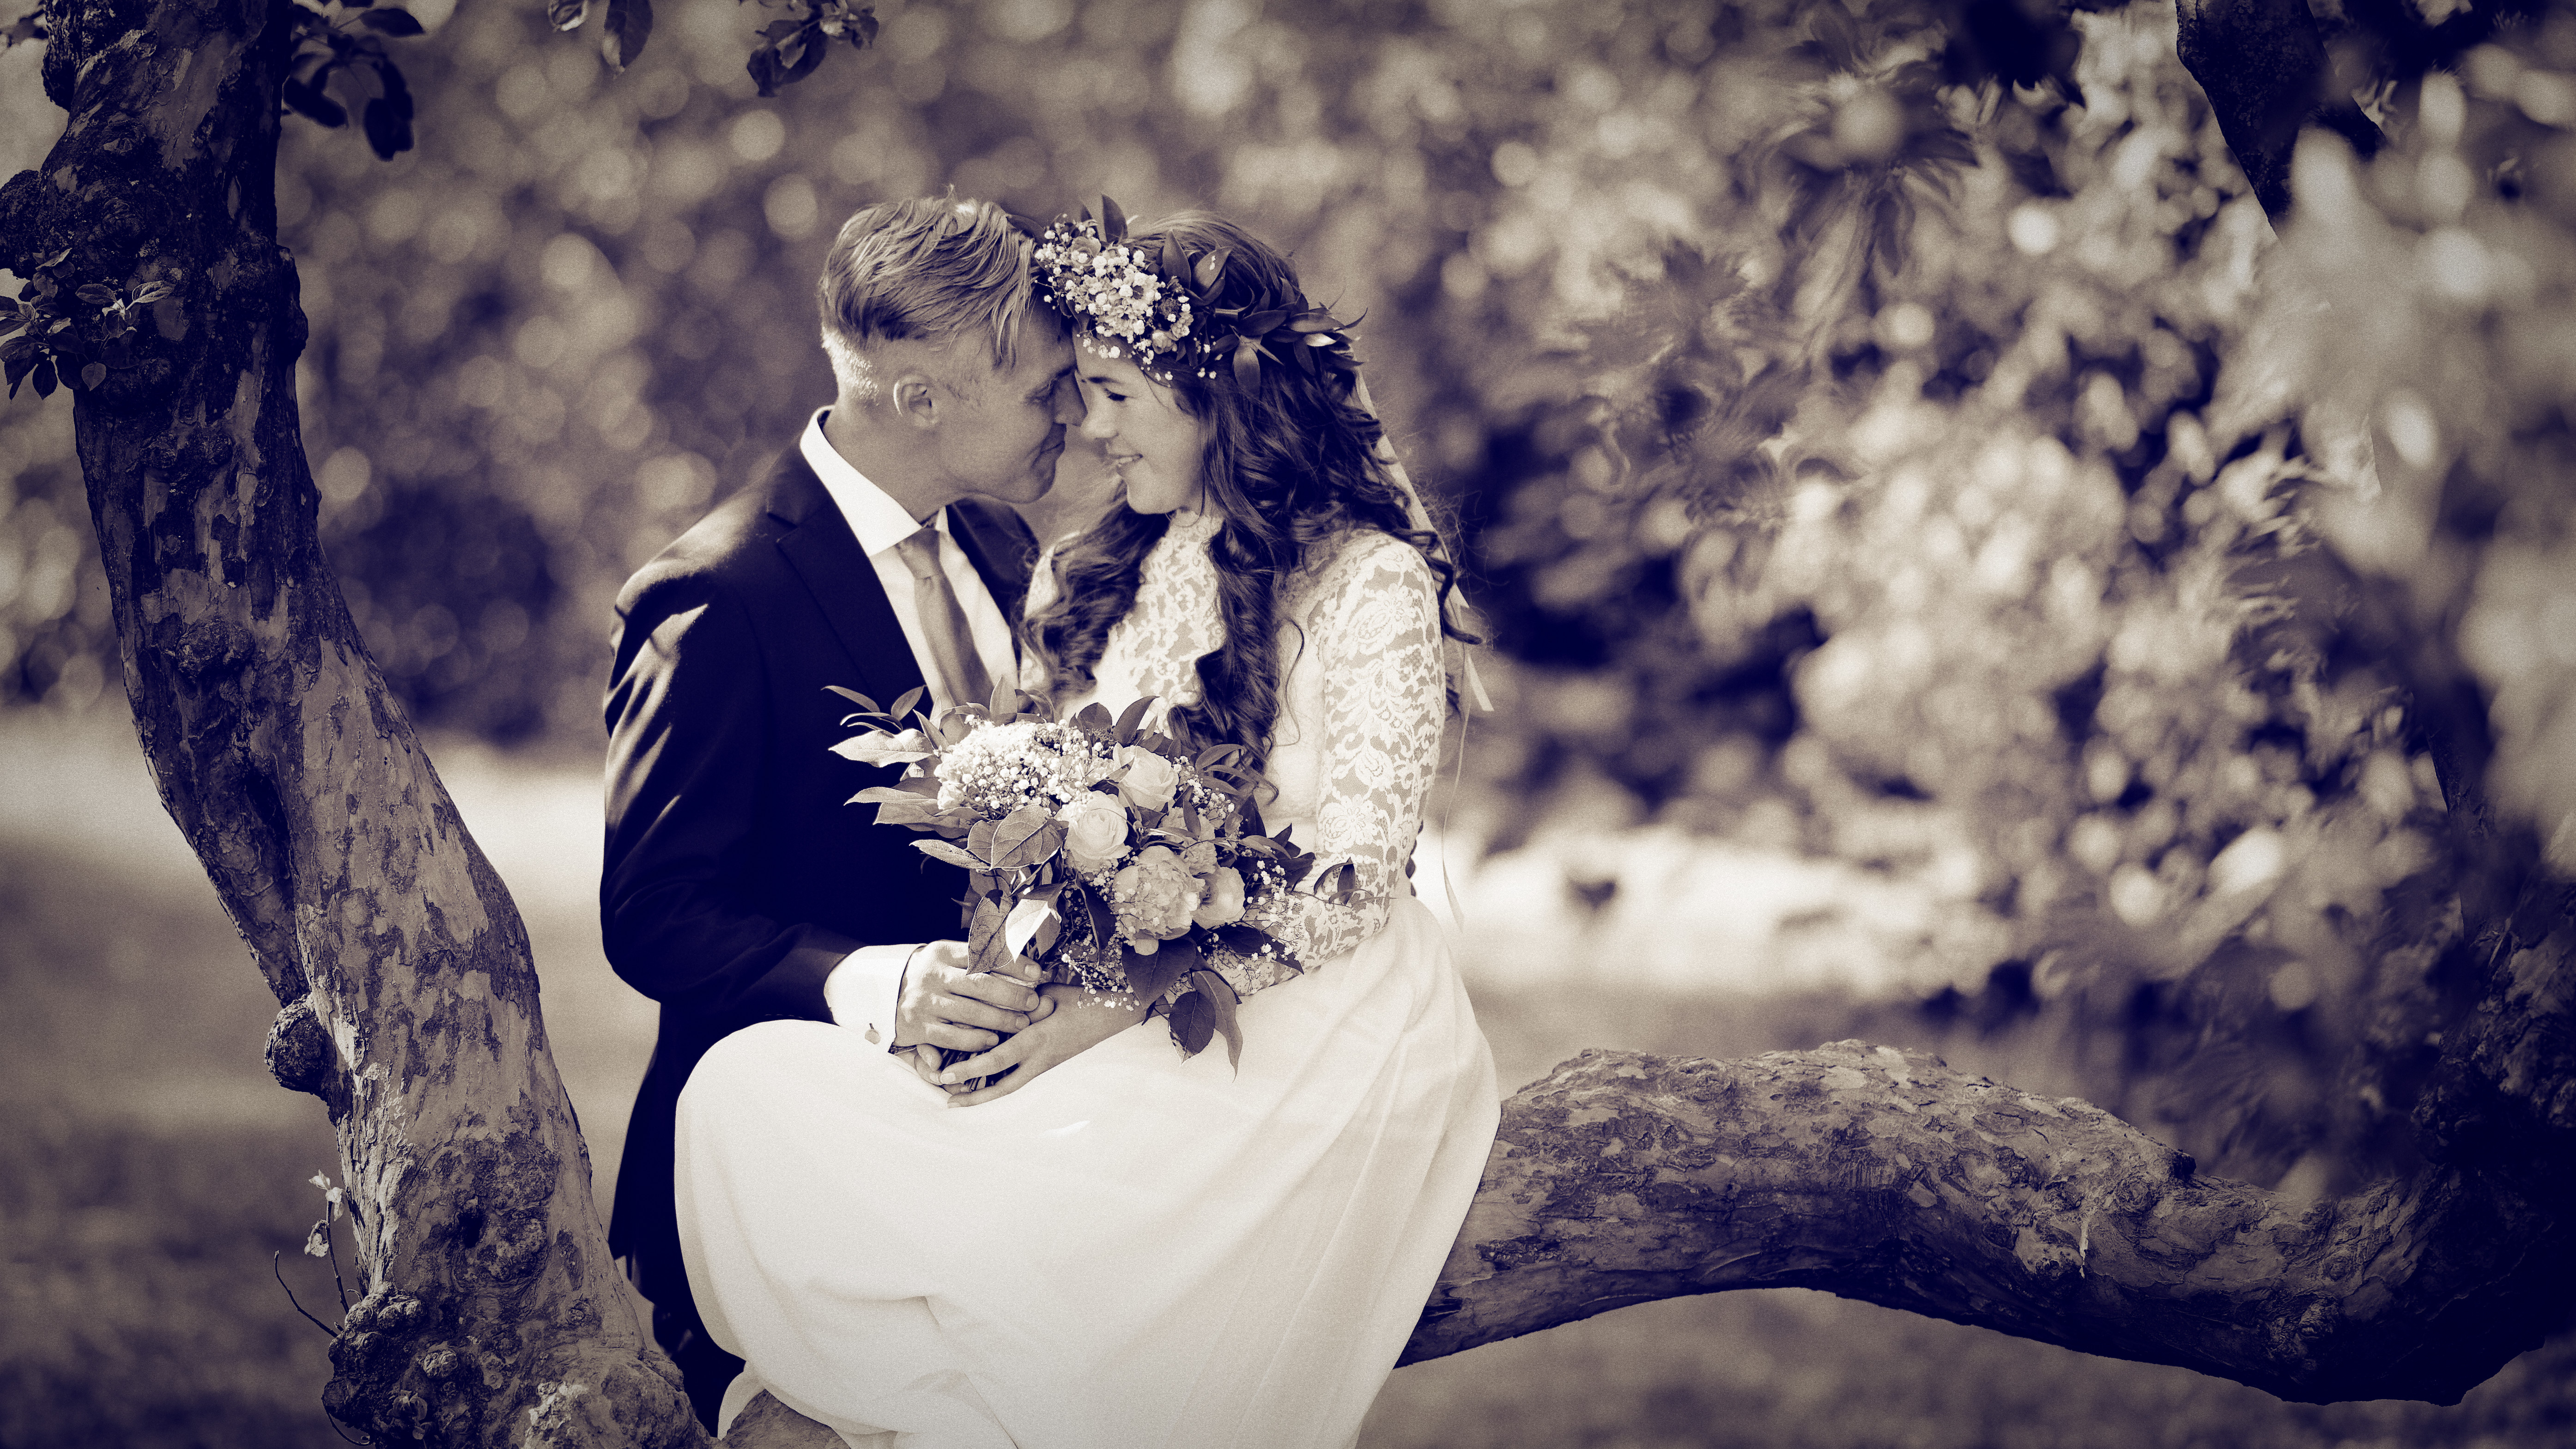 Marcus & Micaela, bröllopsporträtt 4